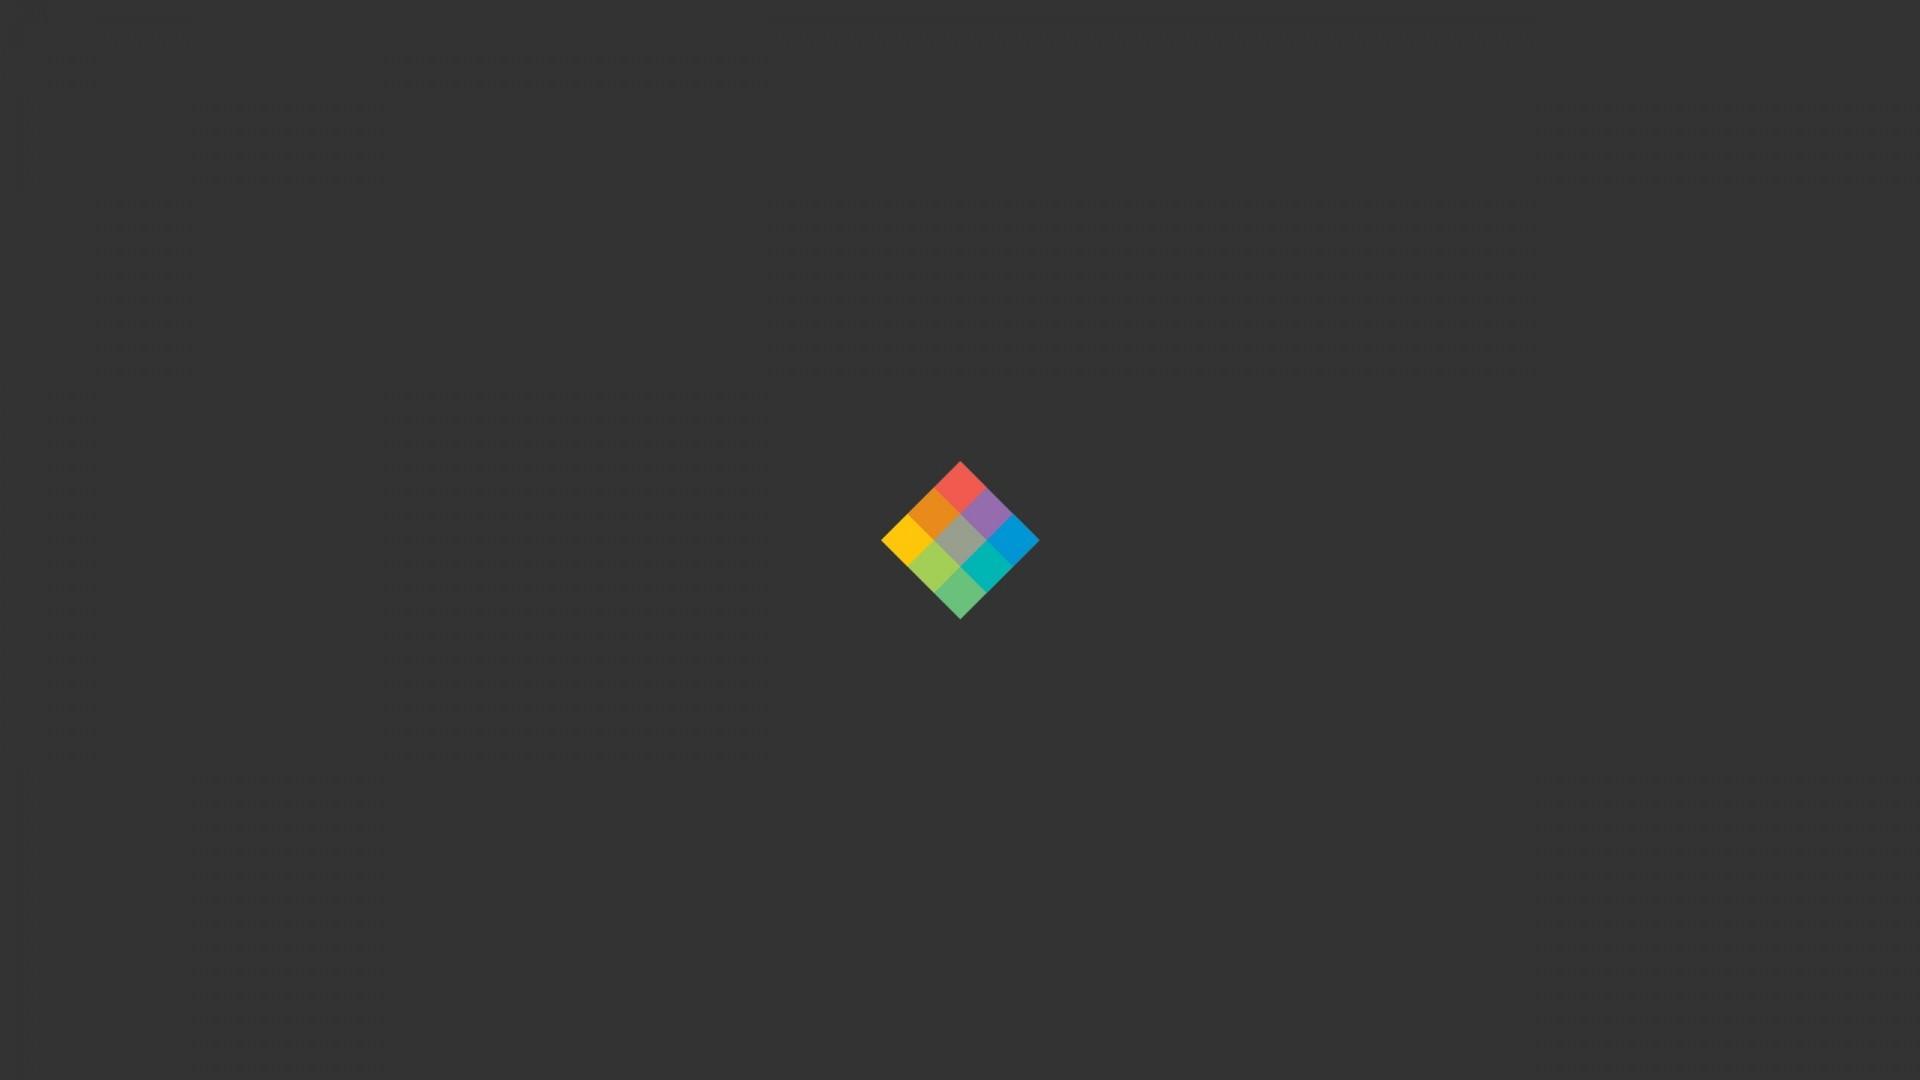 Wallpaper minimalist cube, bright, background Full HD 1080p .